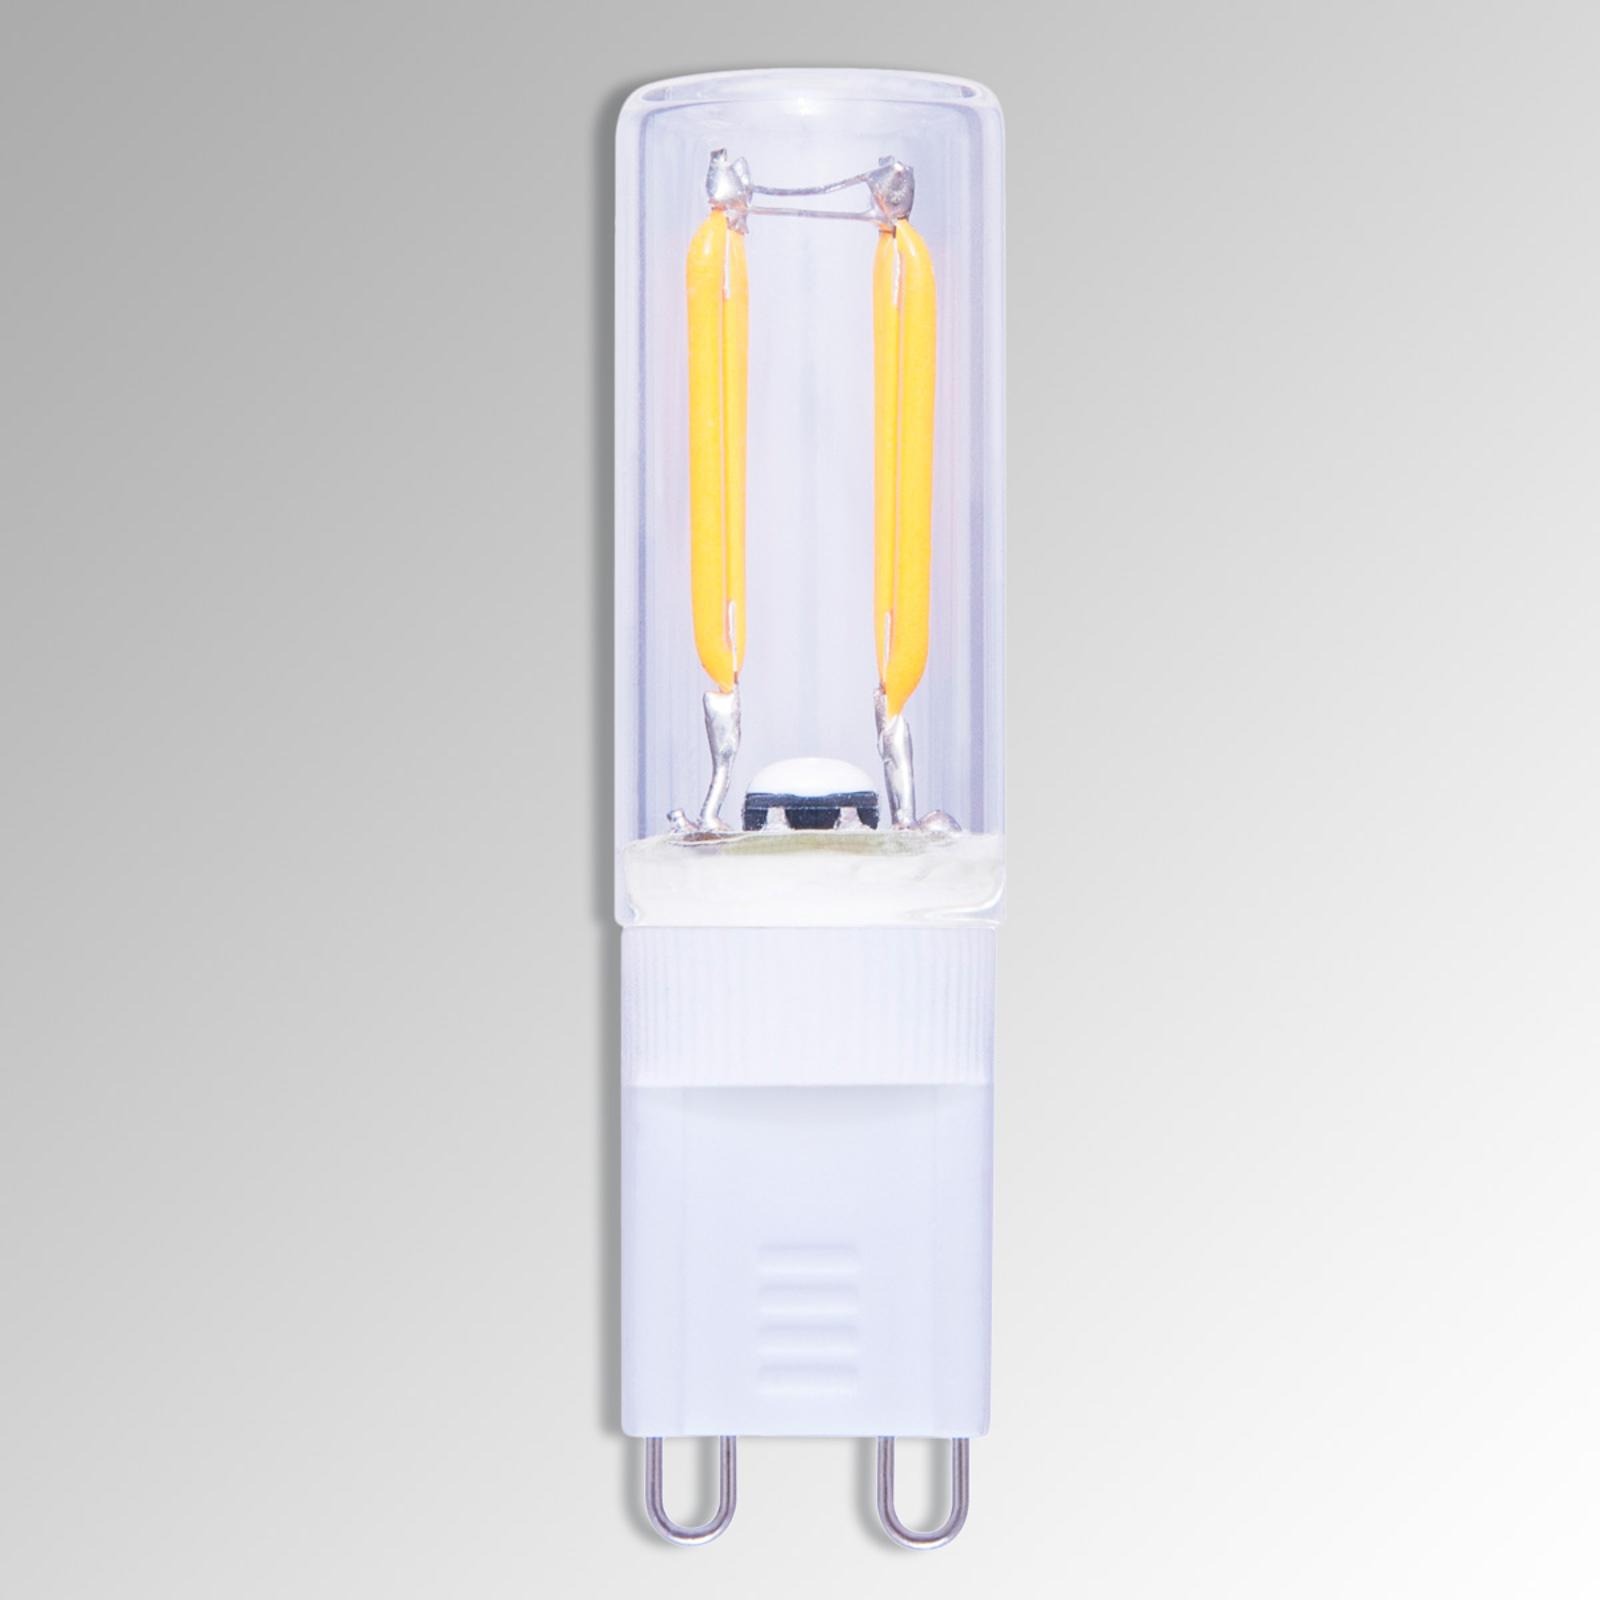 G9 1,5W 822 LED-Stiftlampe in Kohlefadenoptik